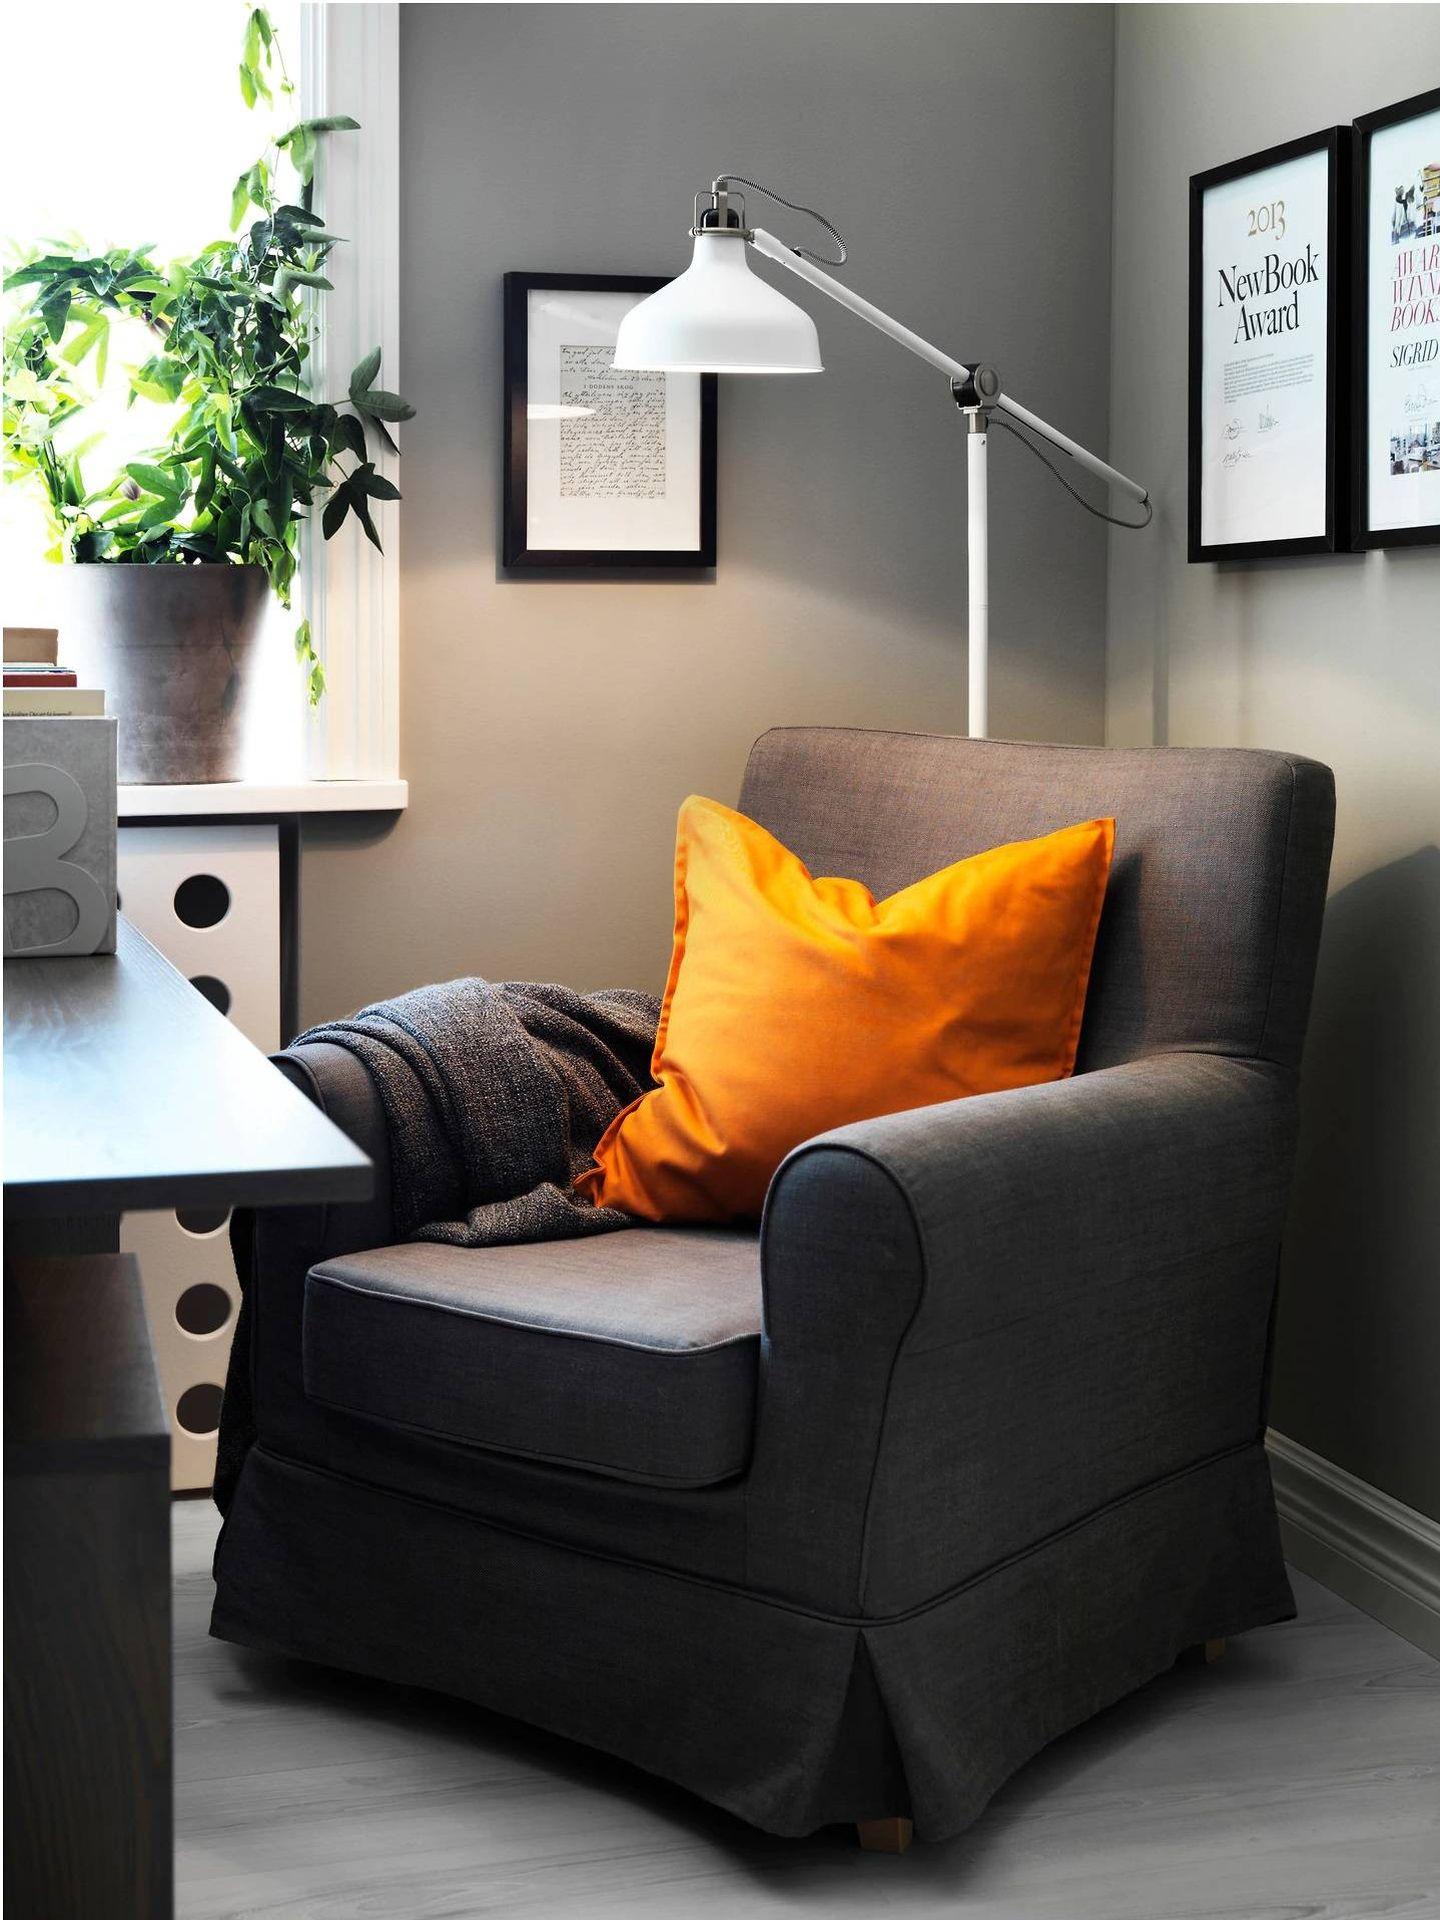 Lámparas perfectas para tu rincón de trabajo, como esta de Ikea. (Cortesía)